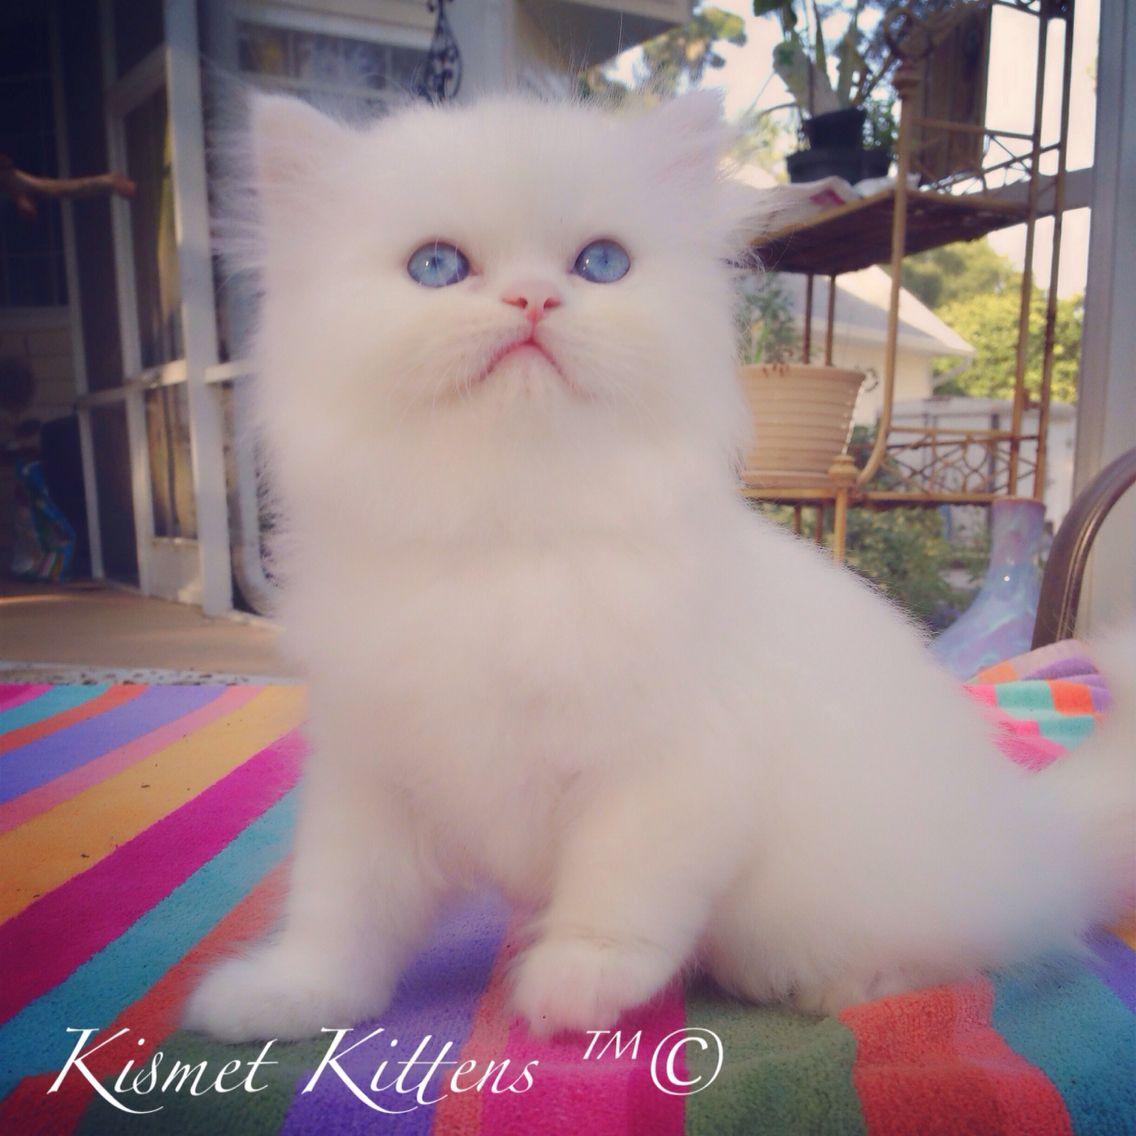 Teacup Kittens For Sale At Kismetkittens To Reserve Web Www Kismetkittens Com Text 813 409 8 Persian Cat Doll Face Teacup Persian Kittens Teacup Kitten